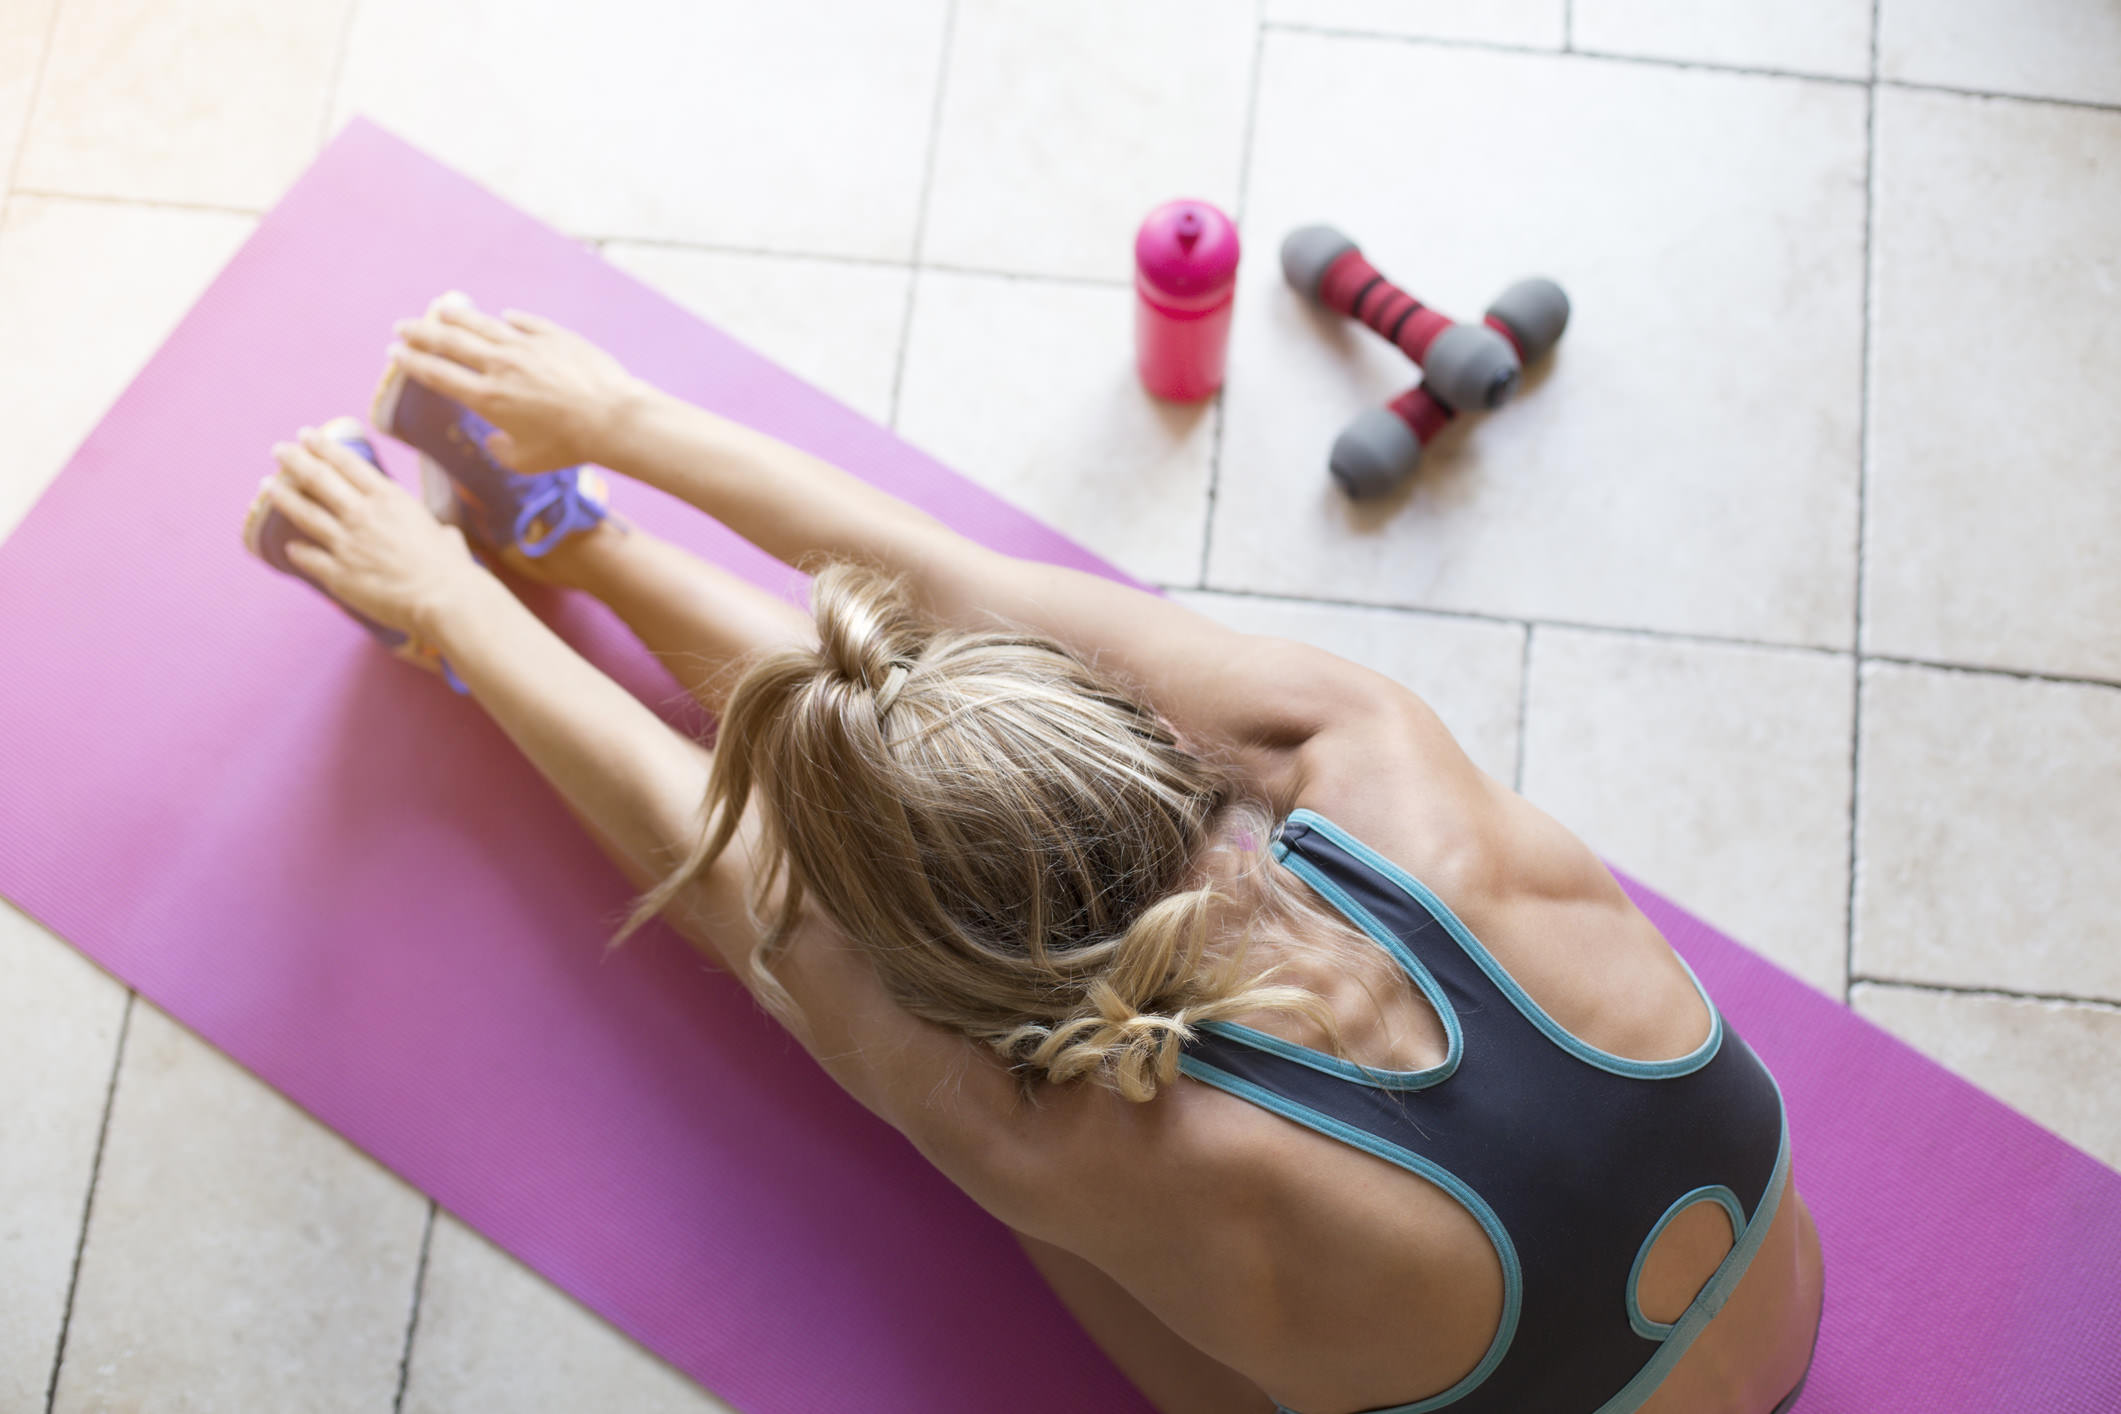 woman stretching on pink yoga mat.jpg